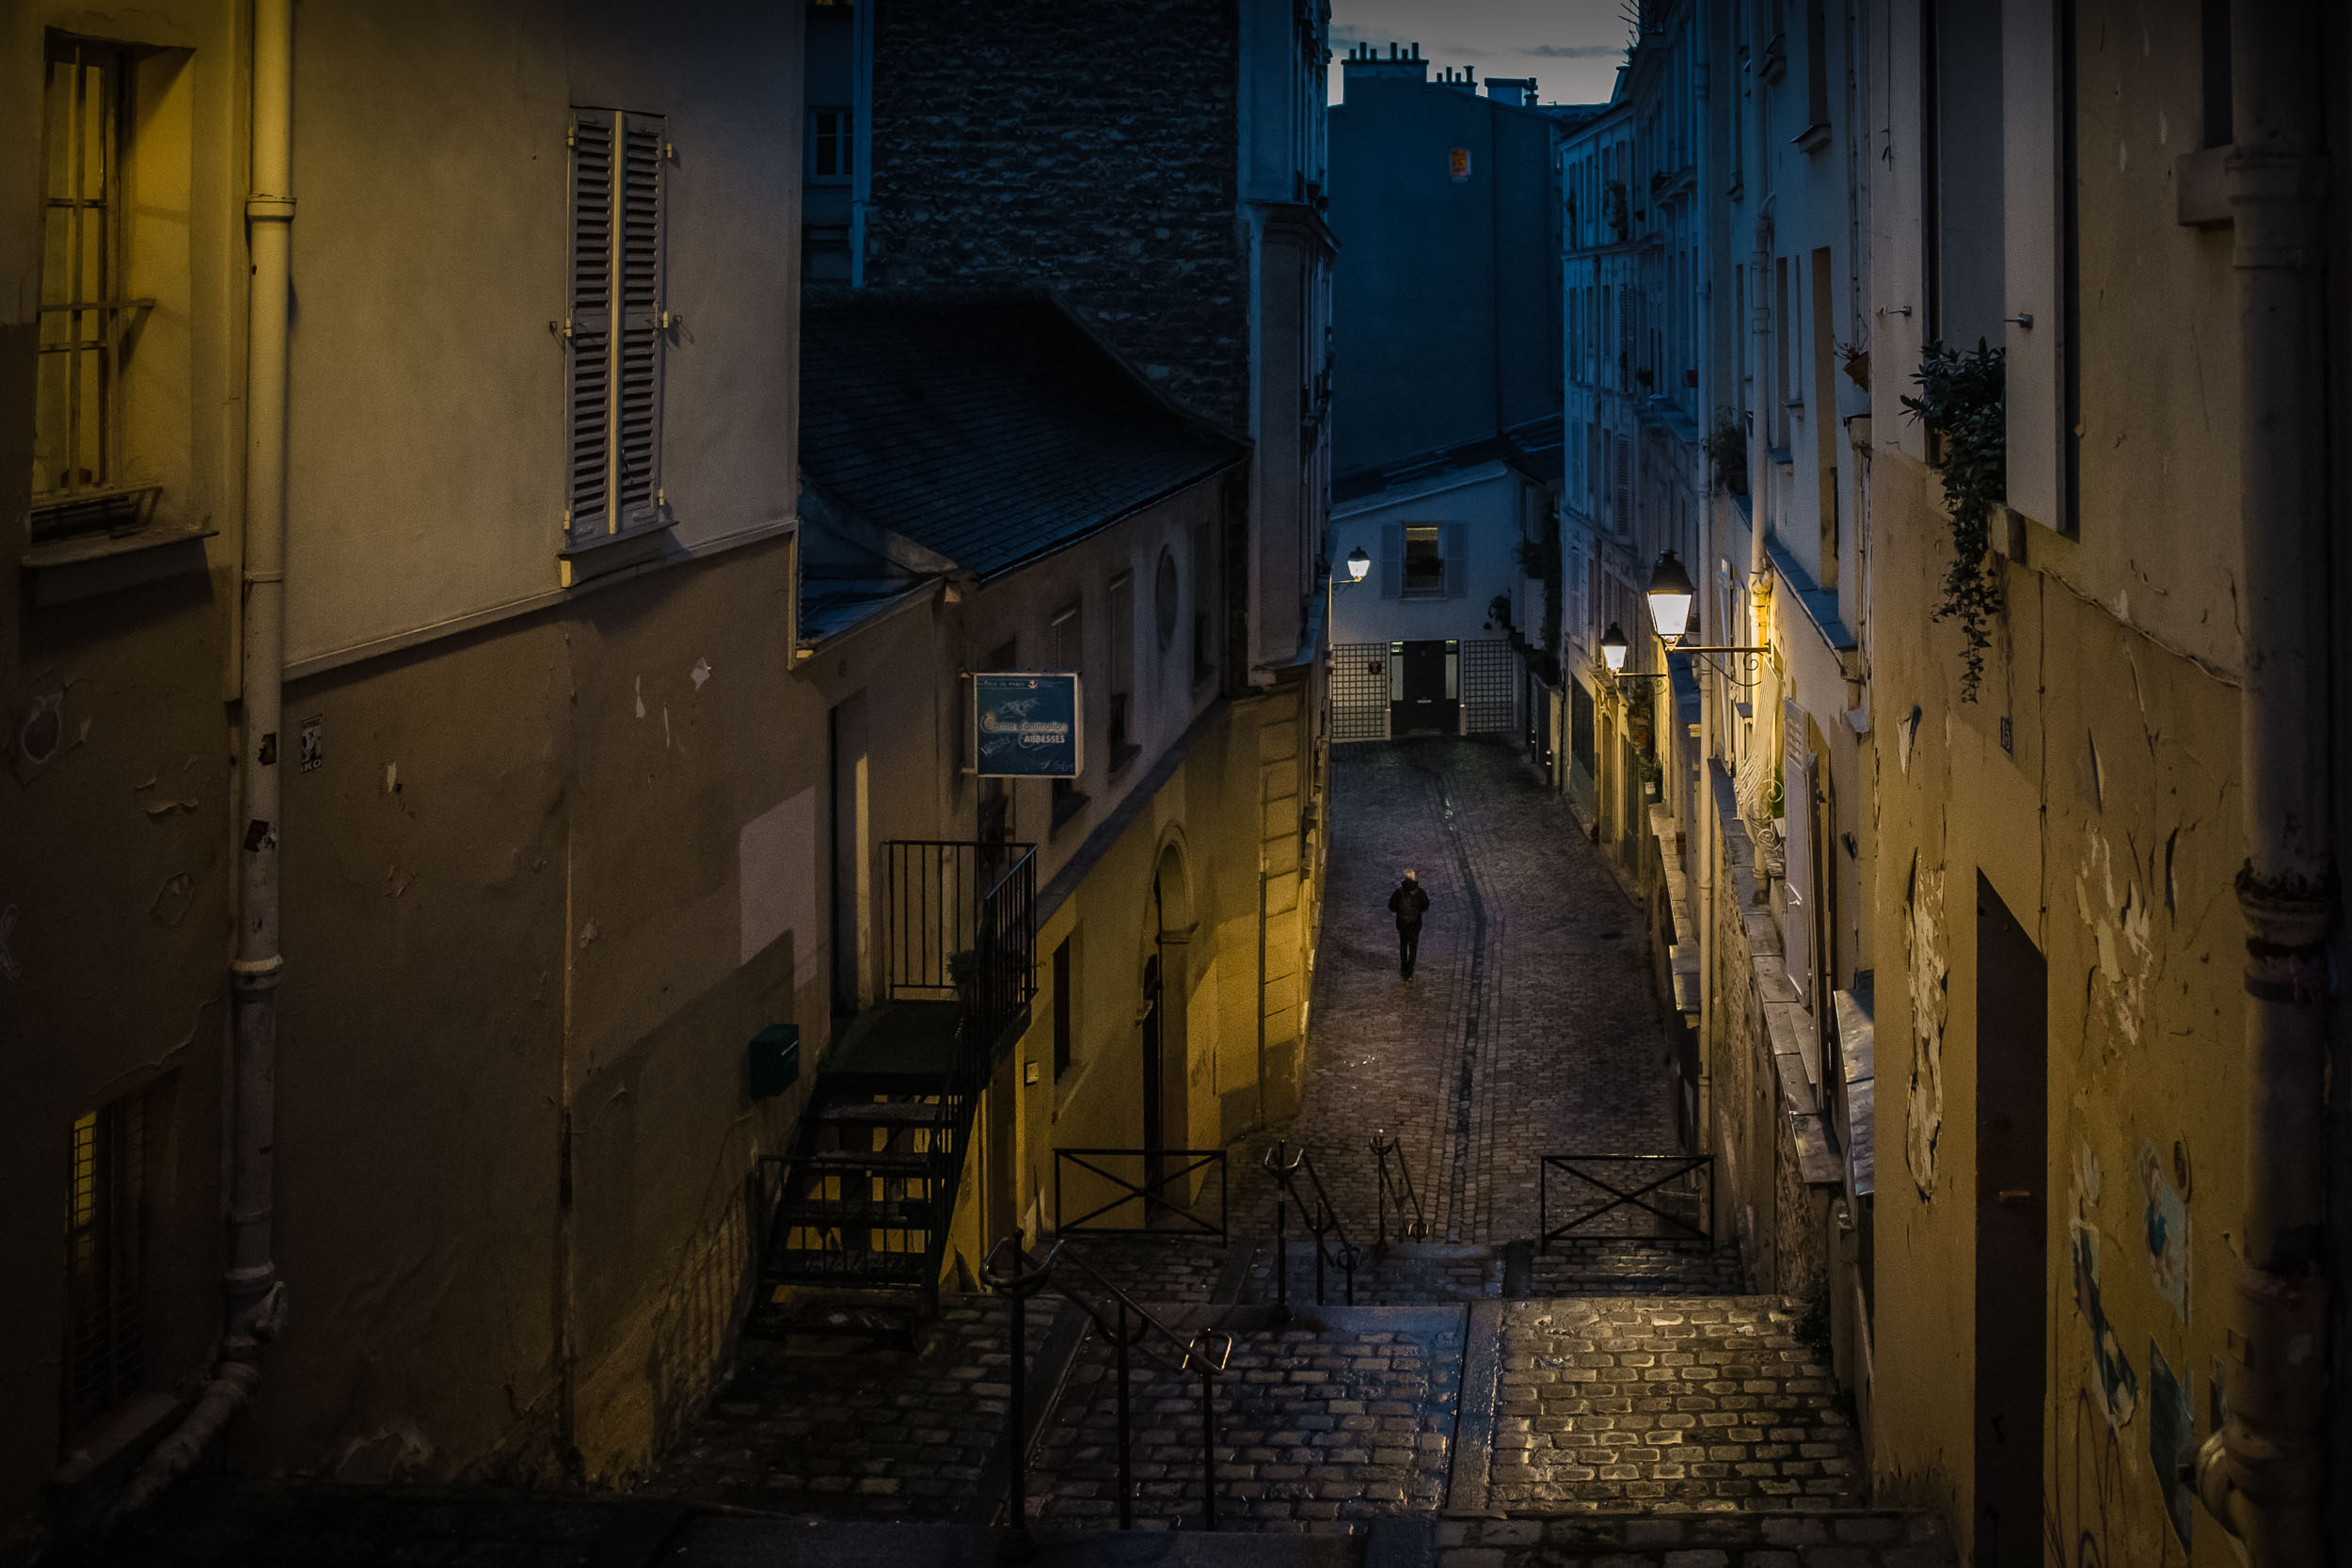 Paris-Montmartre-colorful-nightview.jpg